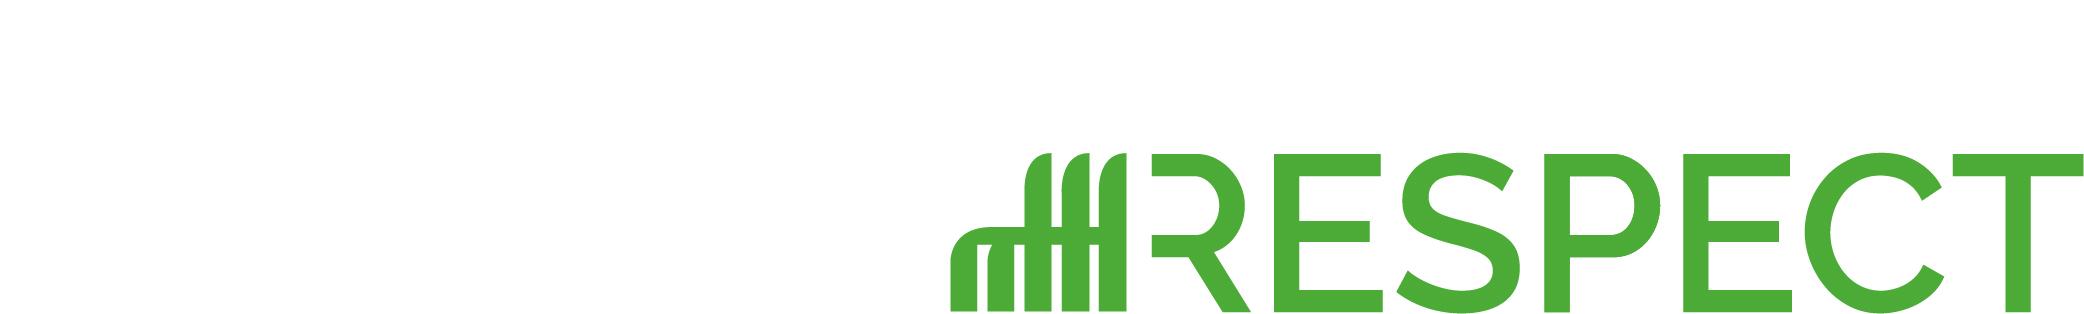 respect, impegnogreen, greenpledge